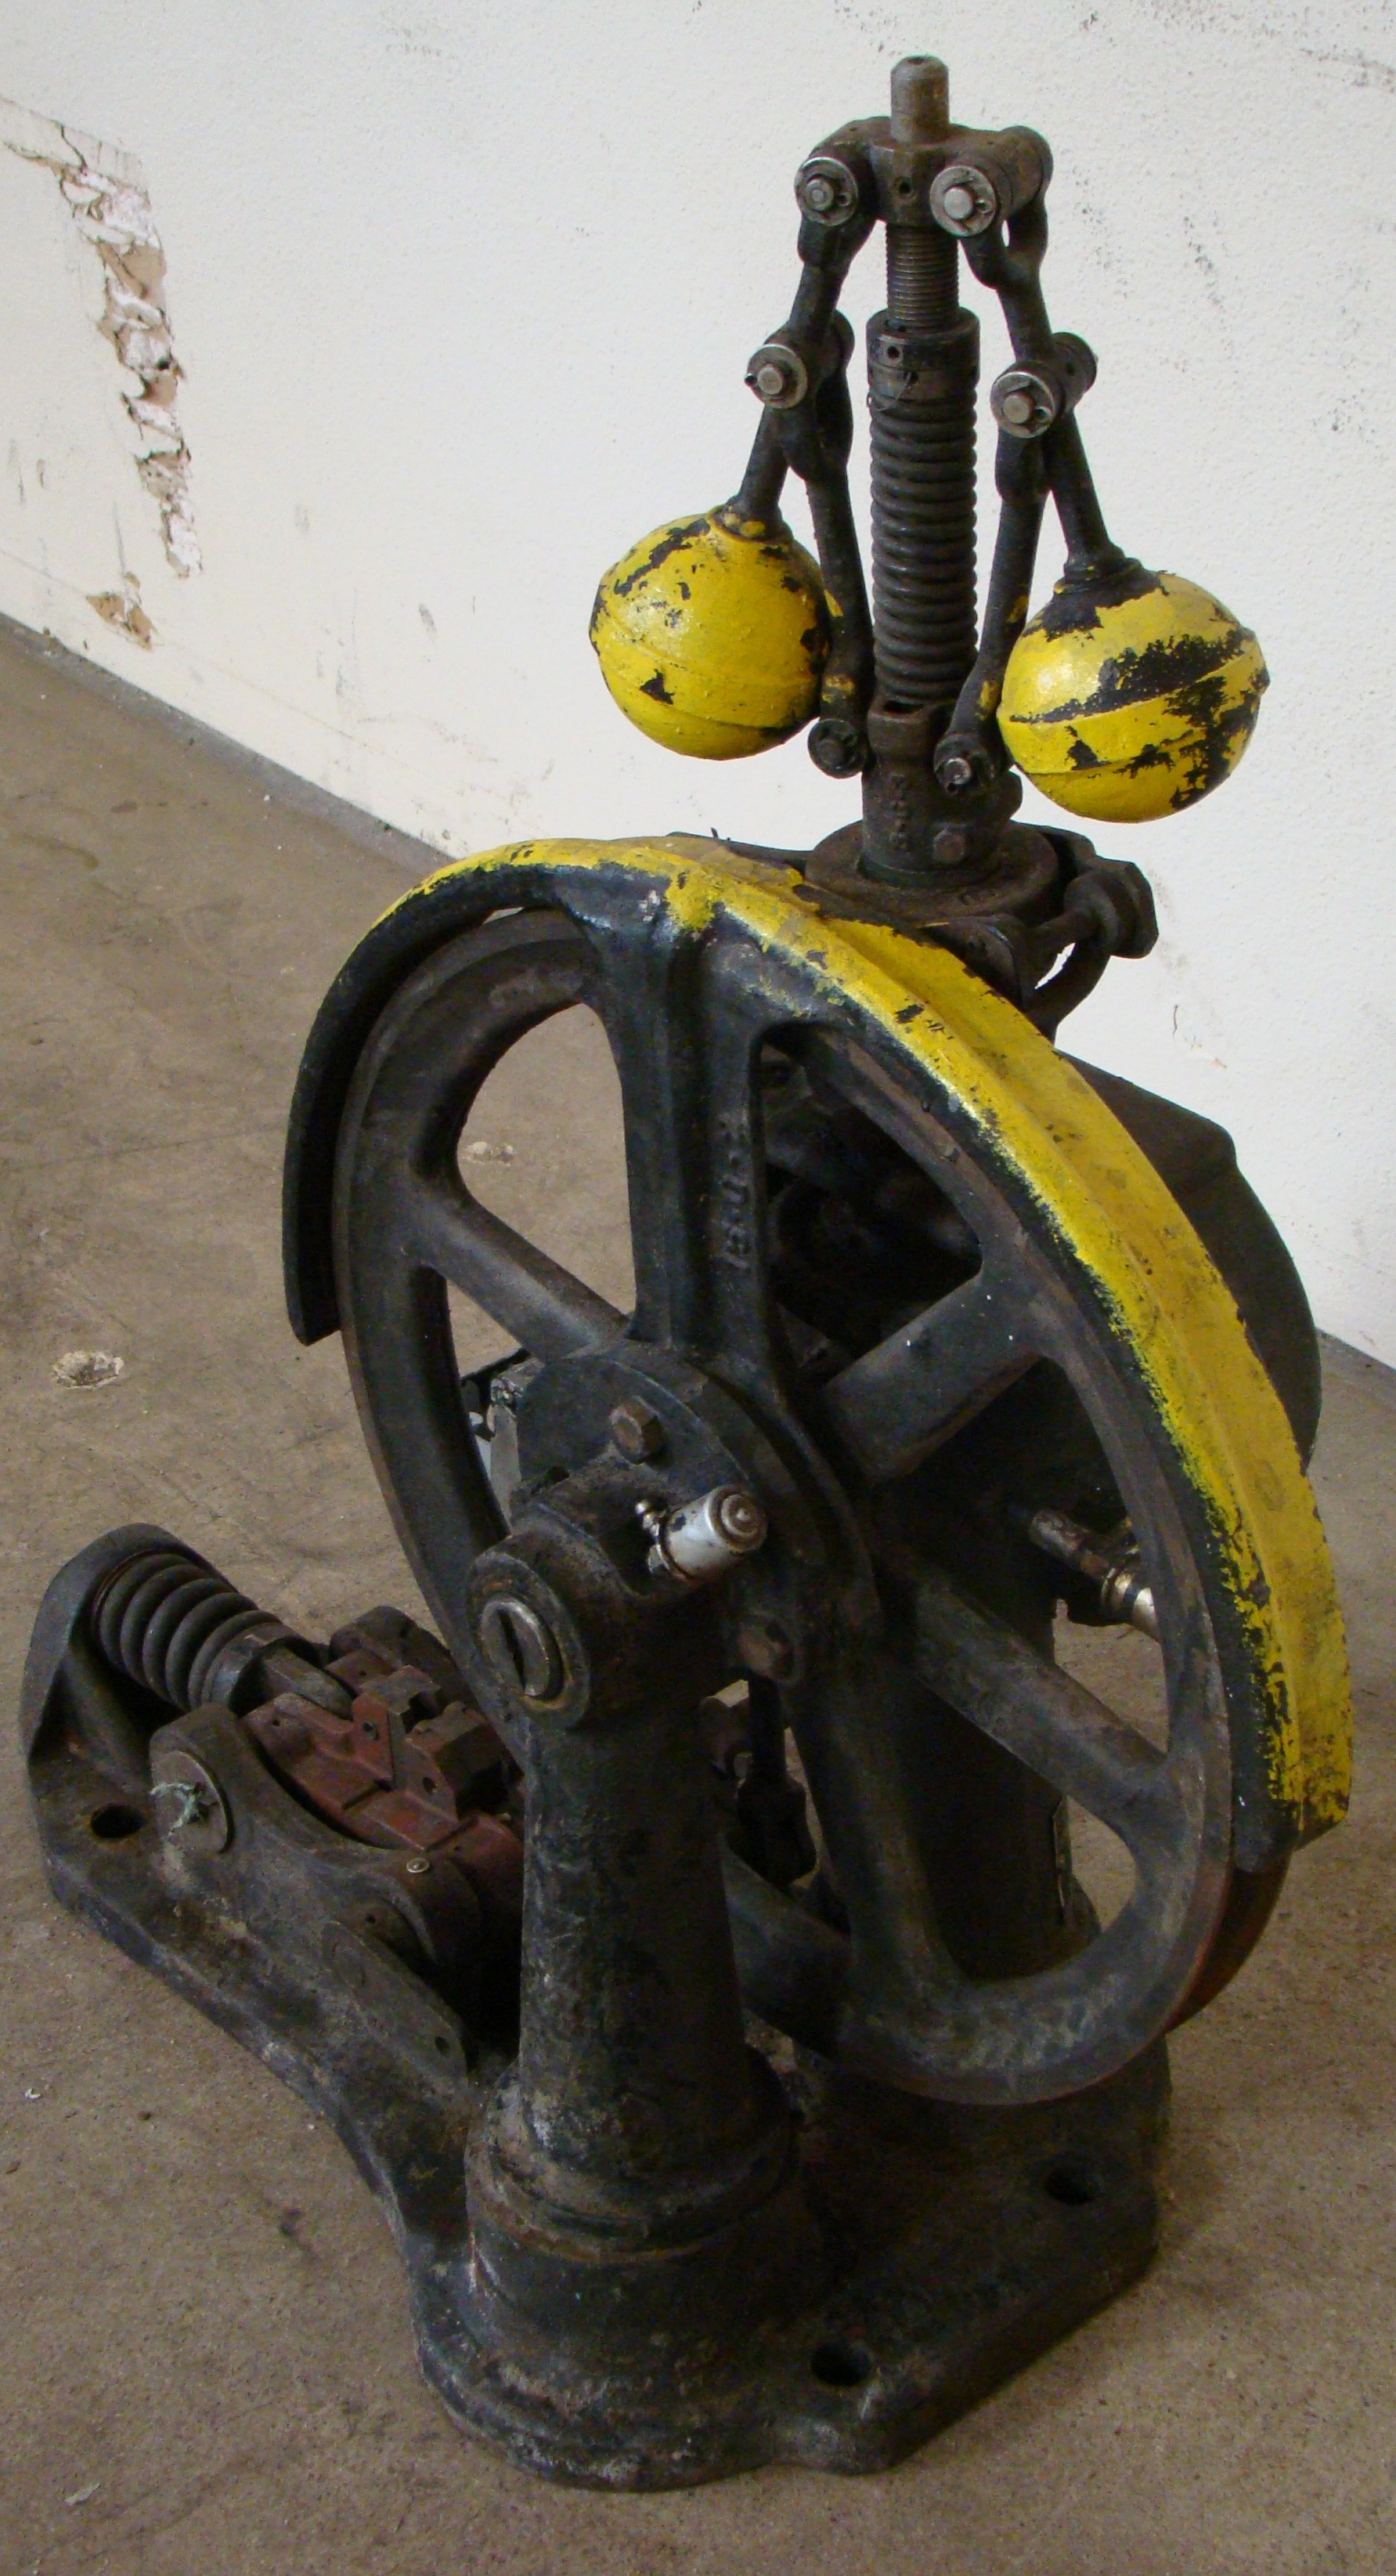 Antique Otis Elevator Safety Governor Brake, Cast Iron Brass Steampunk Carspeed, 700 FPM - Image 2 of 5